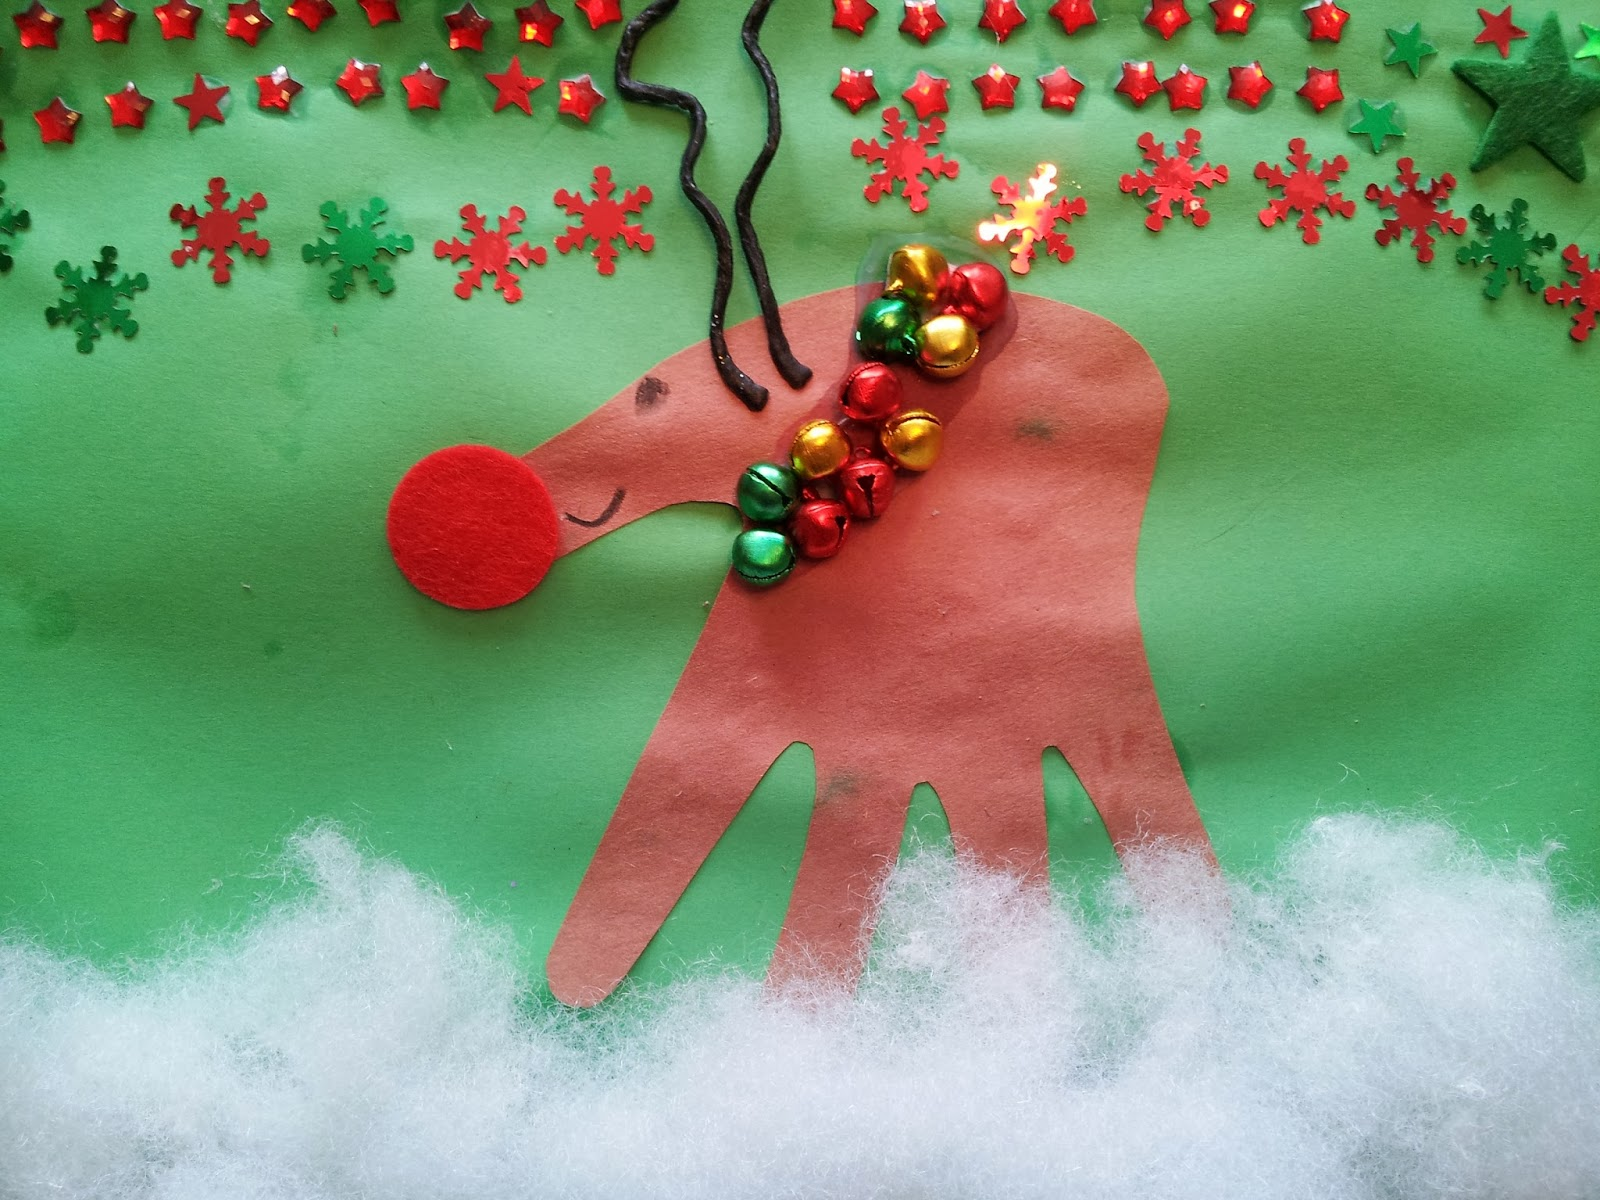 Christmas craft, crafts, kids crafts, handprint crafts